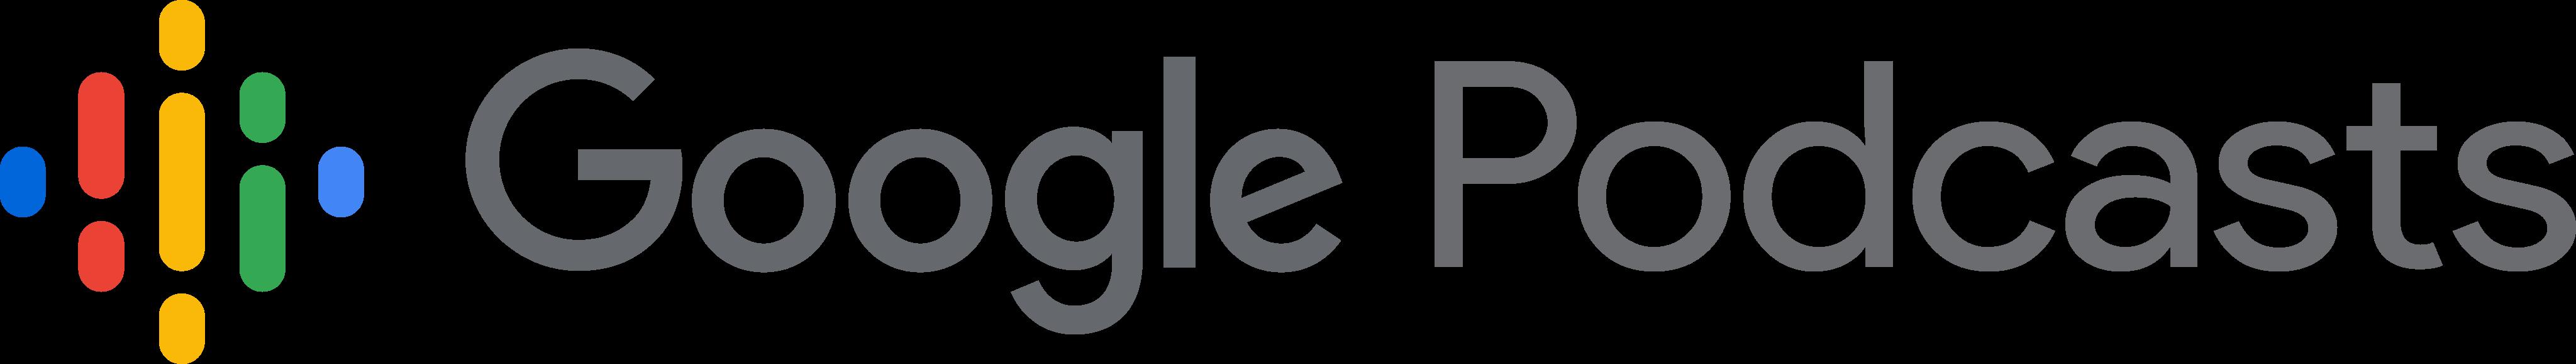 google-podcasts-logo-1